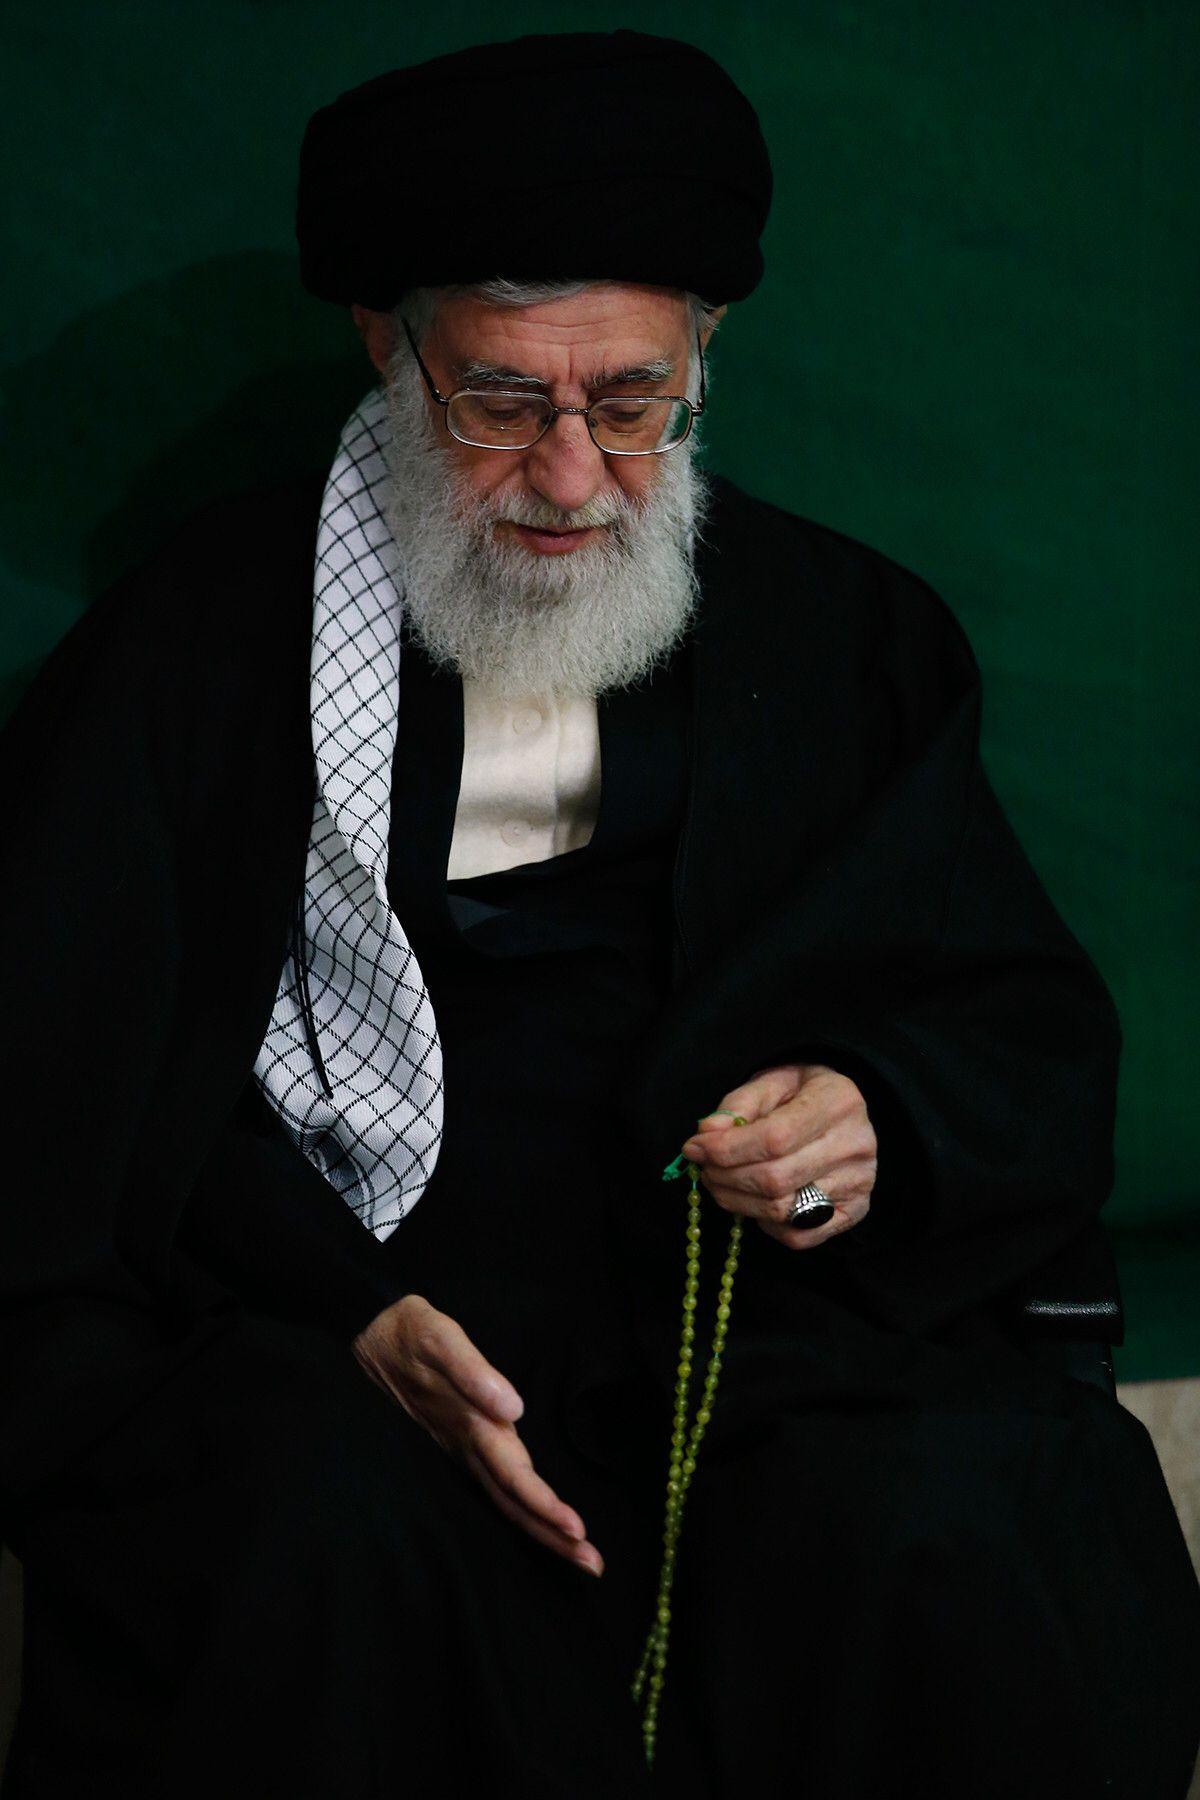 Agha muharram 2013 islam muharram leader